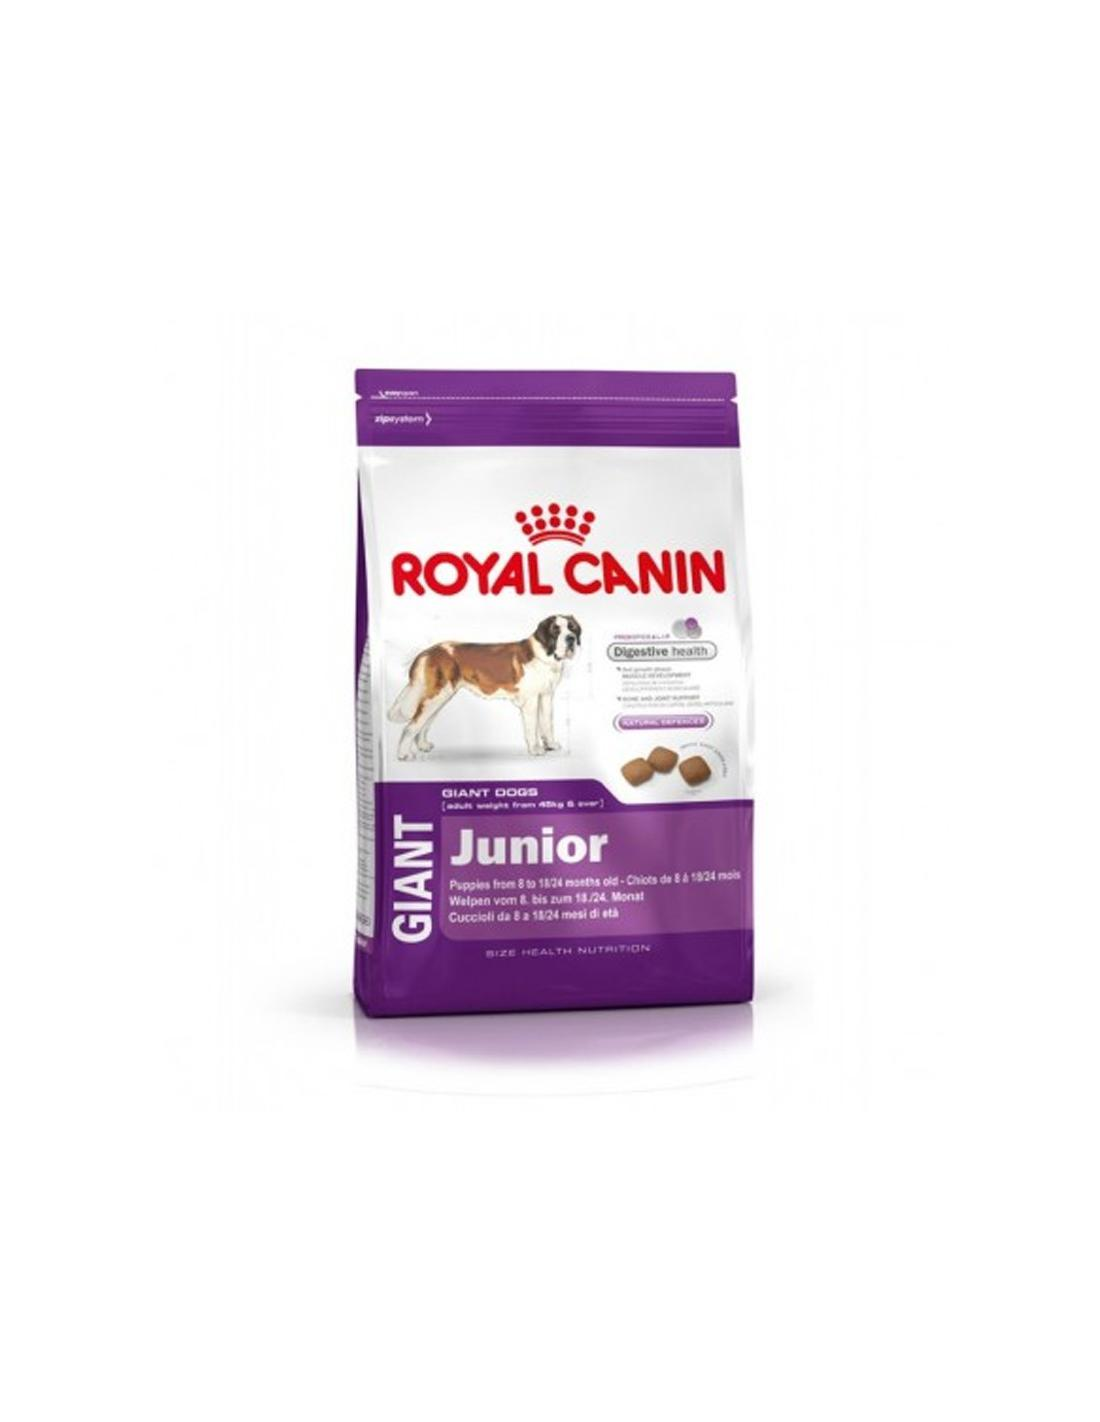 GIANT JUNIOR 15KG ROYAL CANIN - 1